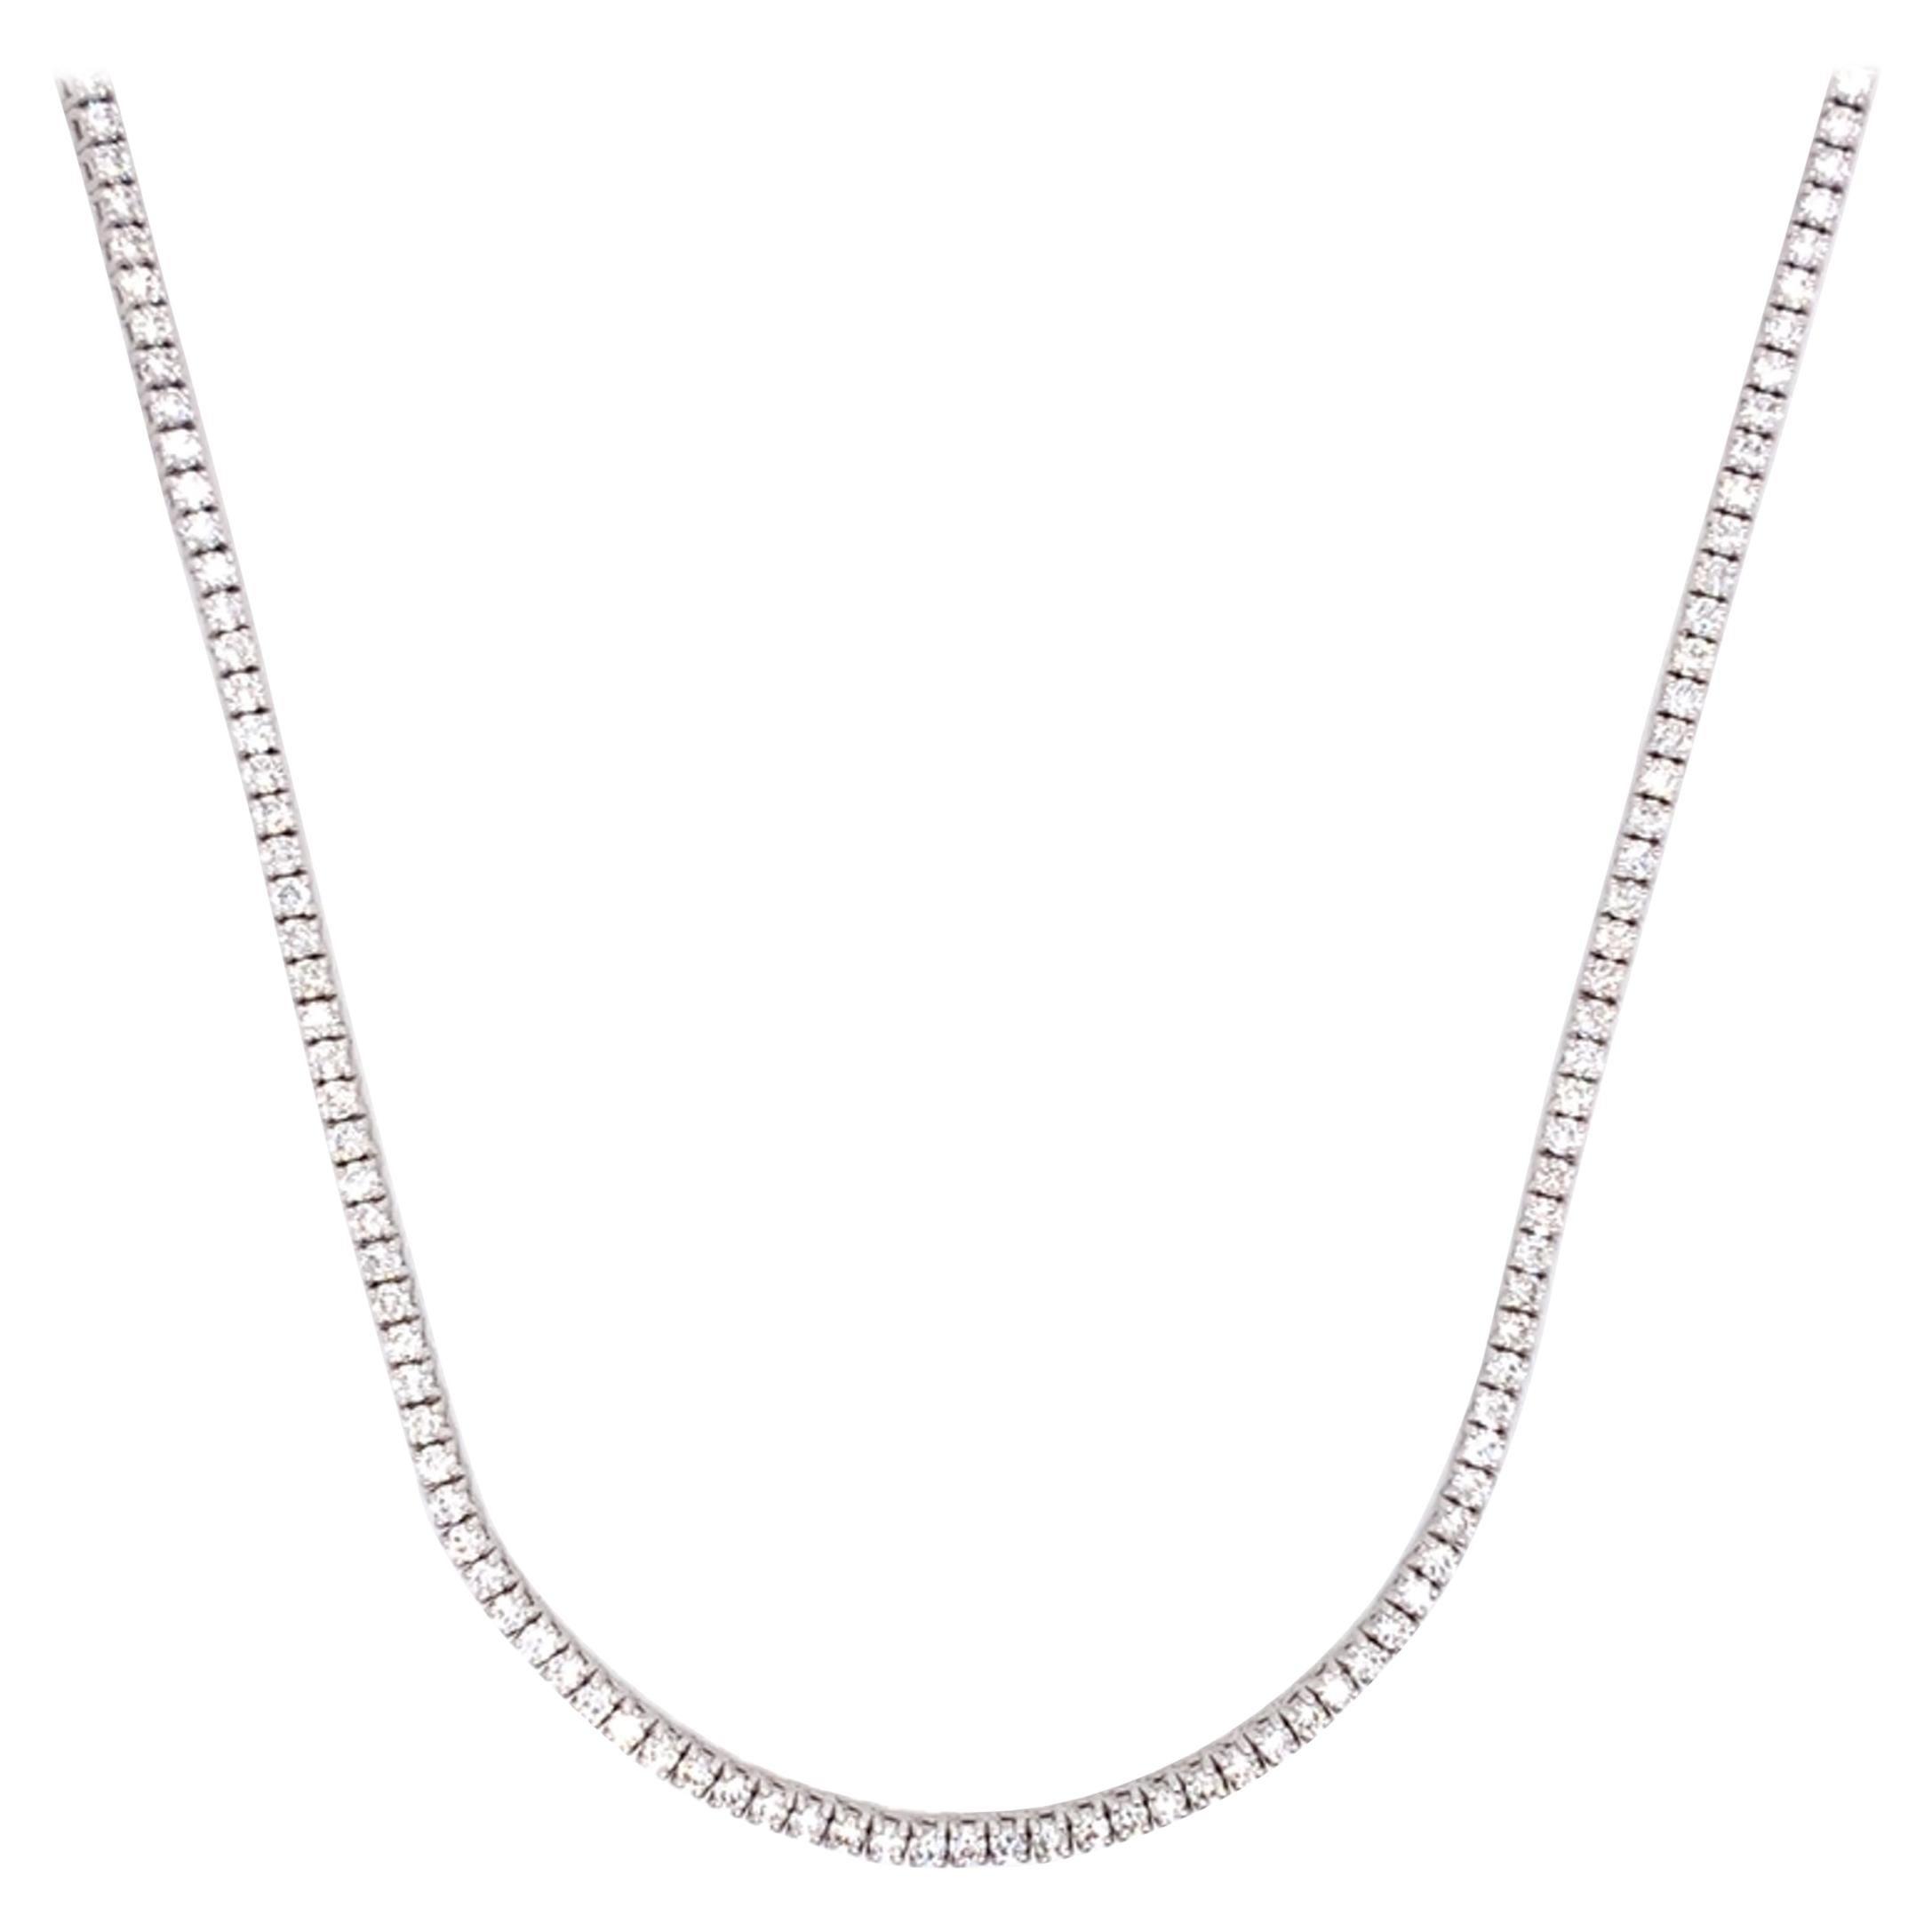 Diamond Tennis/Line Necklace